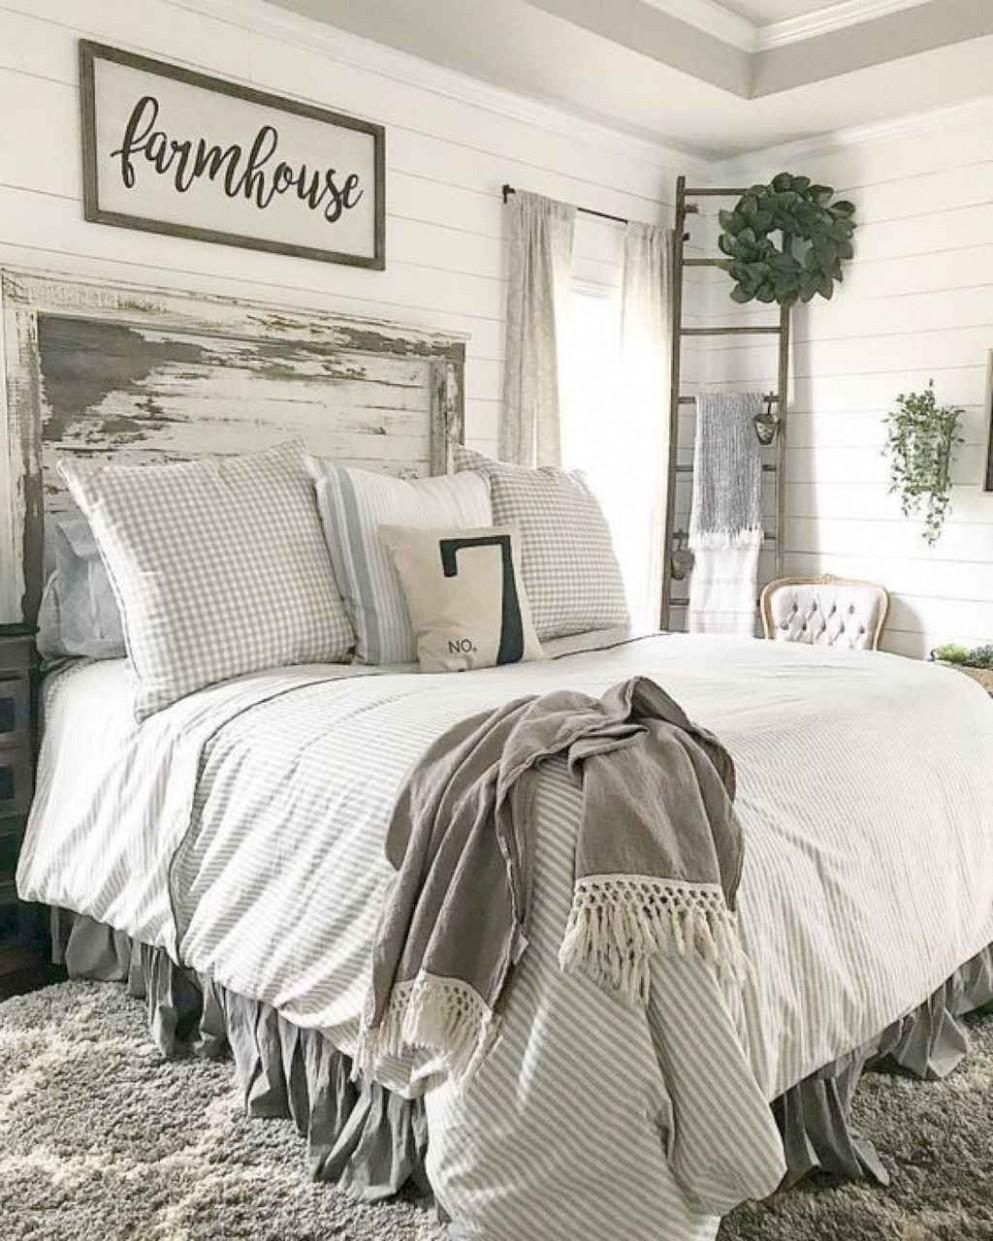 Most Popular Rustic Farmhouse Bedroom Design and Decorating Ideas  - Bedroom Ideas Rustic